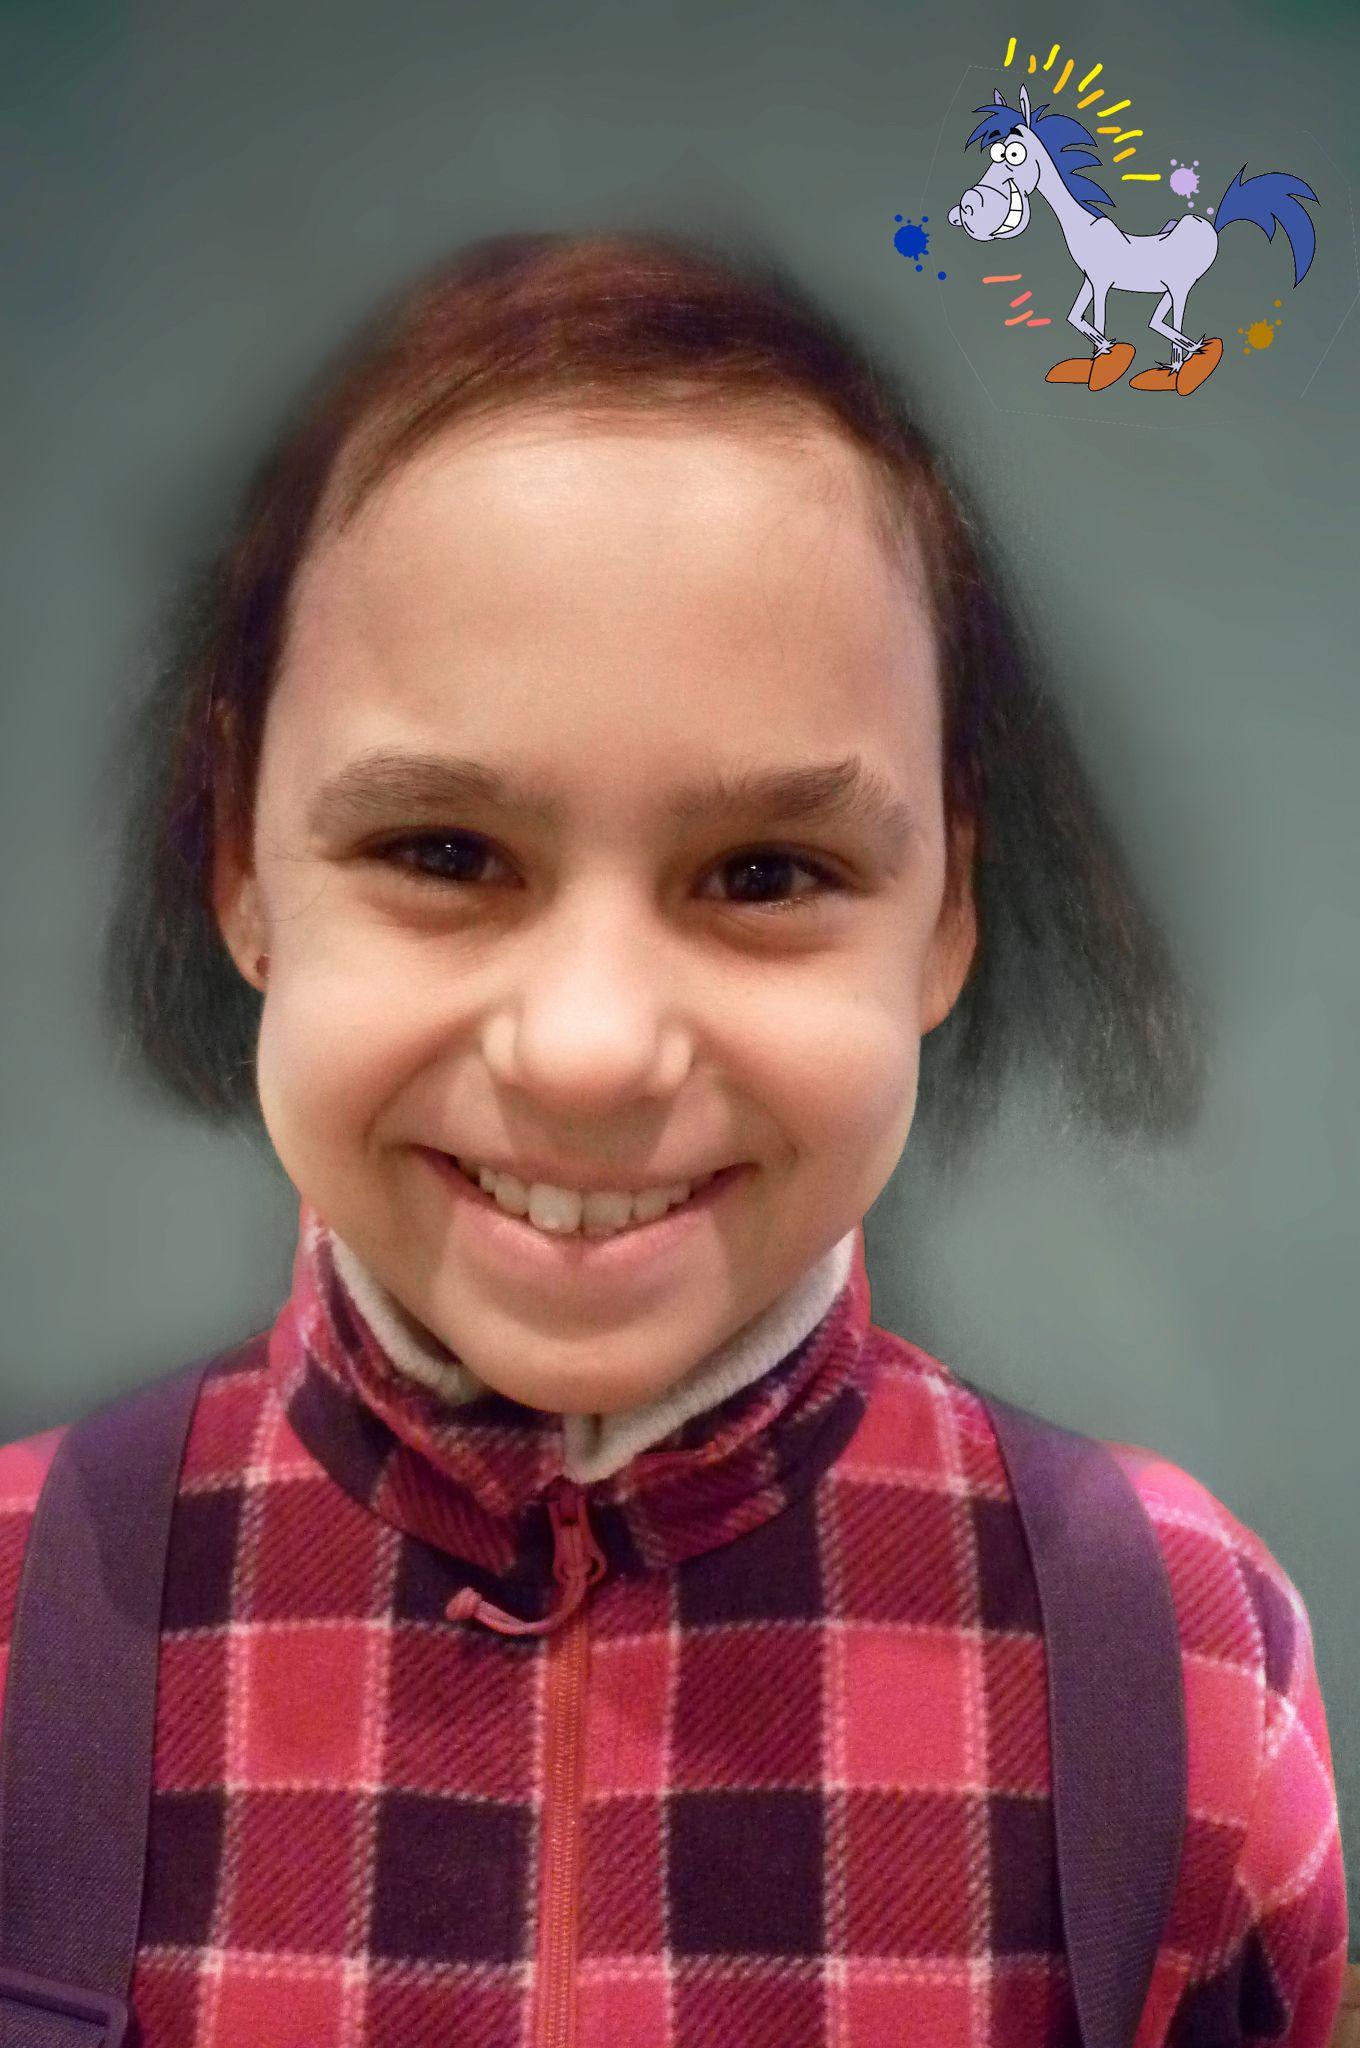 alopecia universalis full body